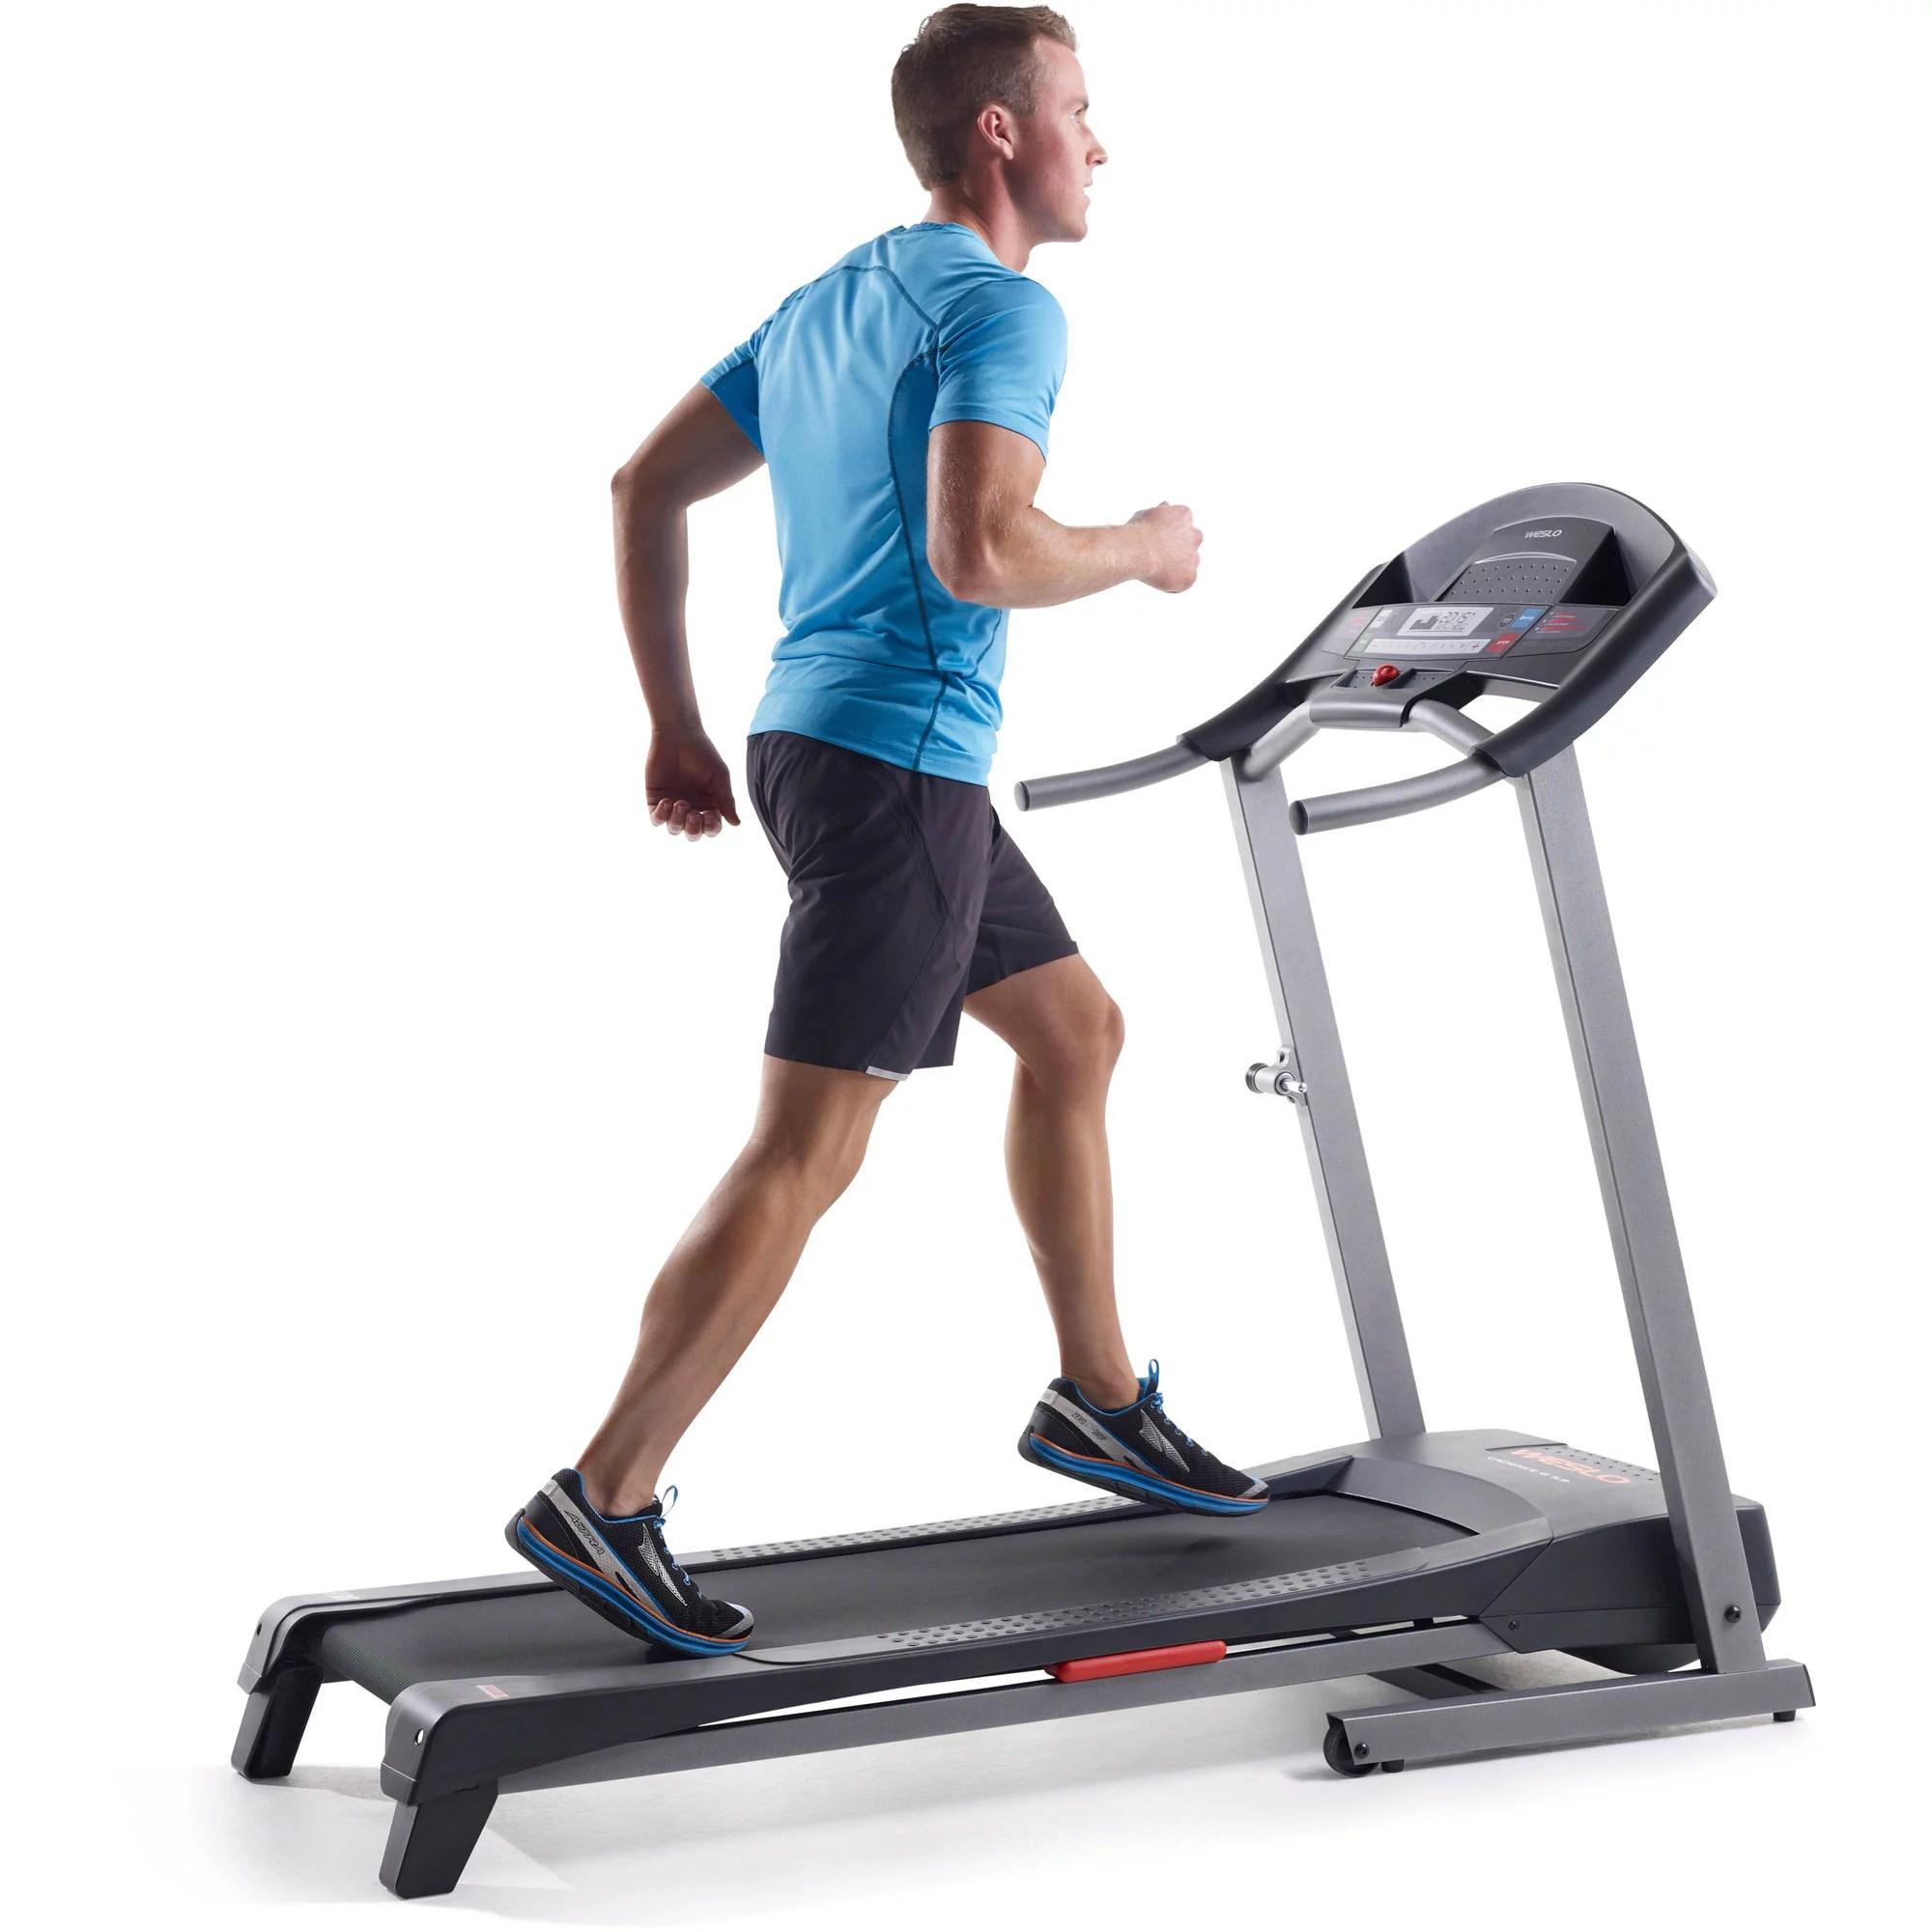 weslo cadence g 5 9i folding treadmill walmart com dc motor controller scr diagram permanent magnet electric treadmill motor wiring diagram [ 2000 x 2000 Pixel ]